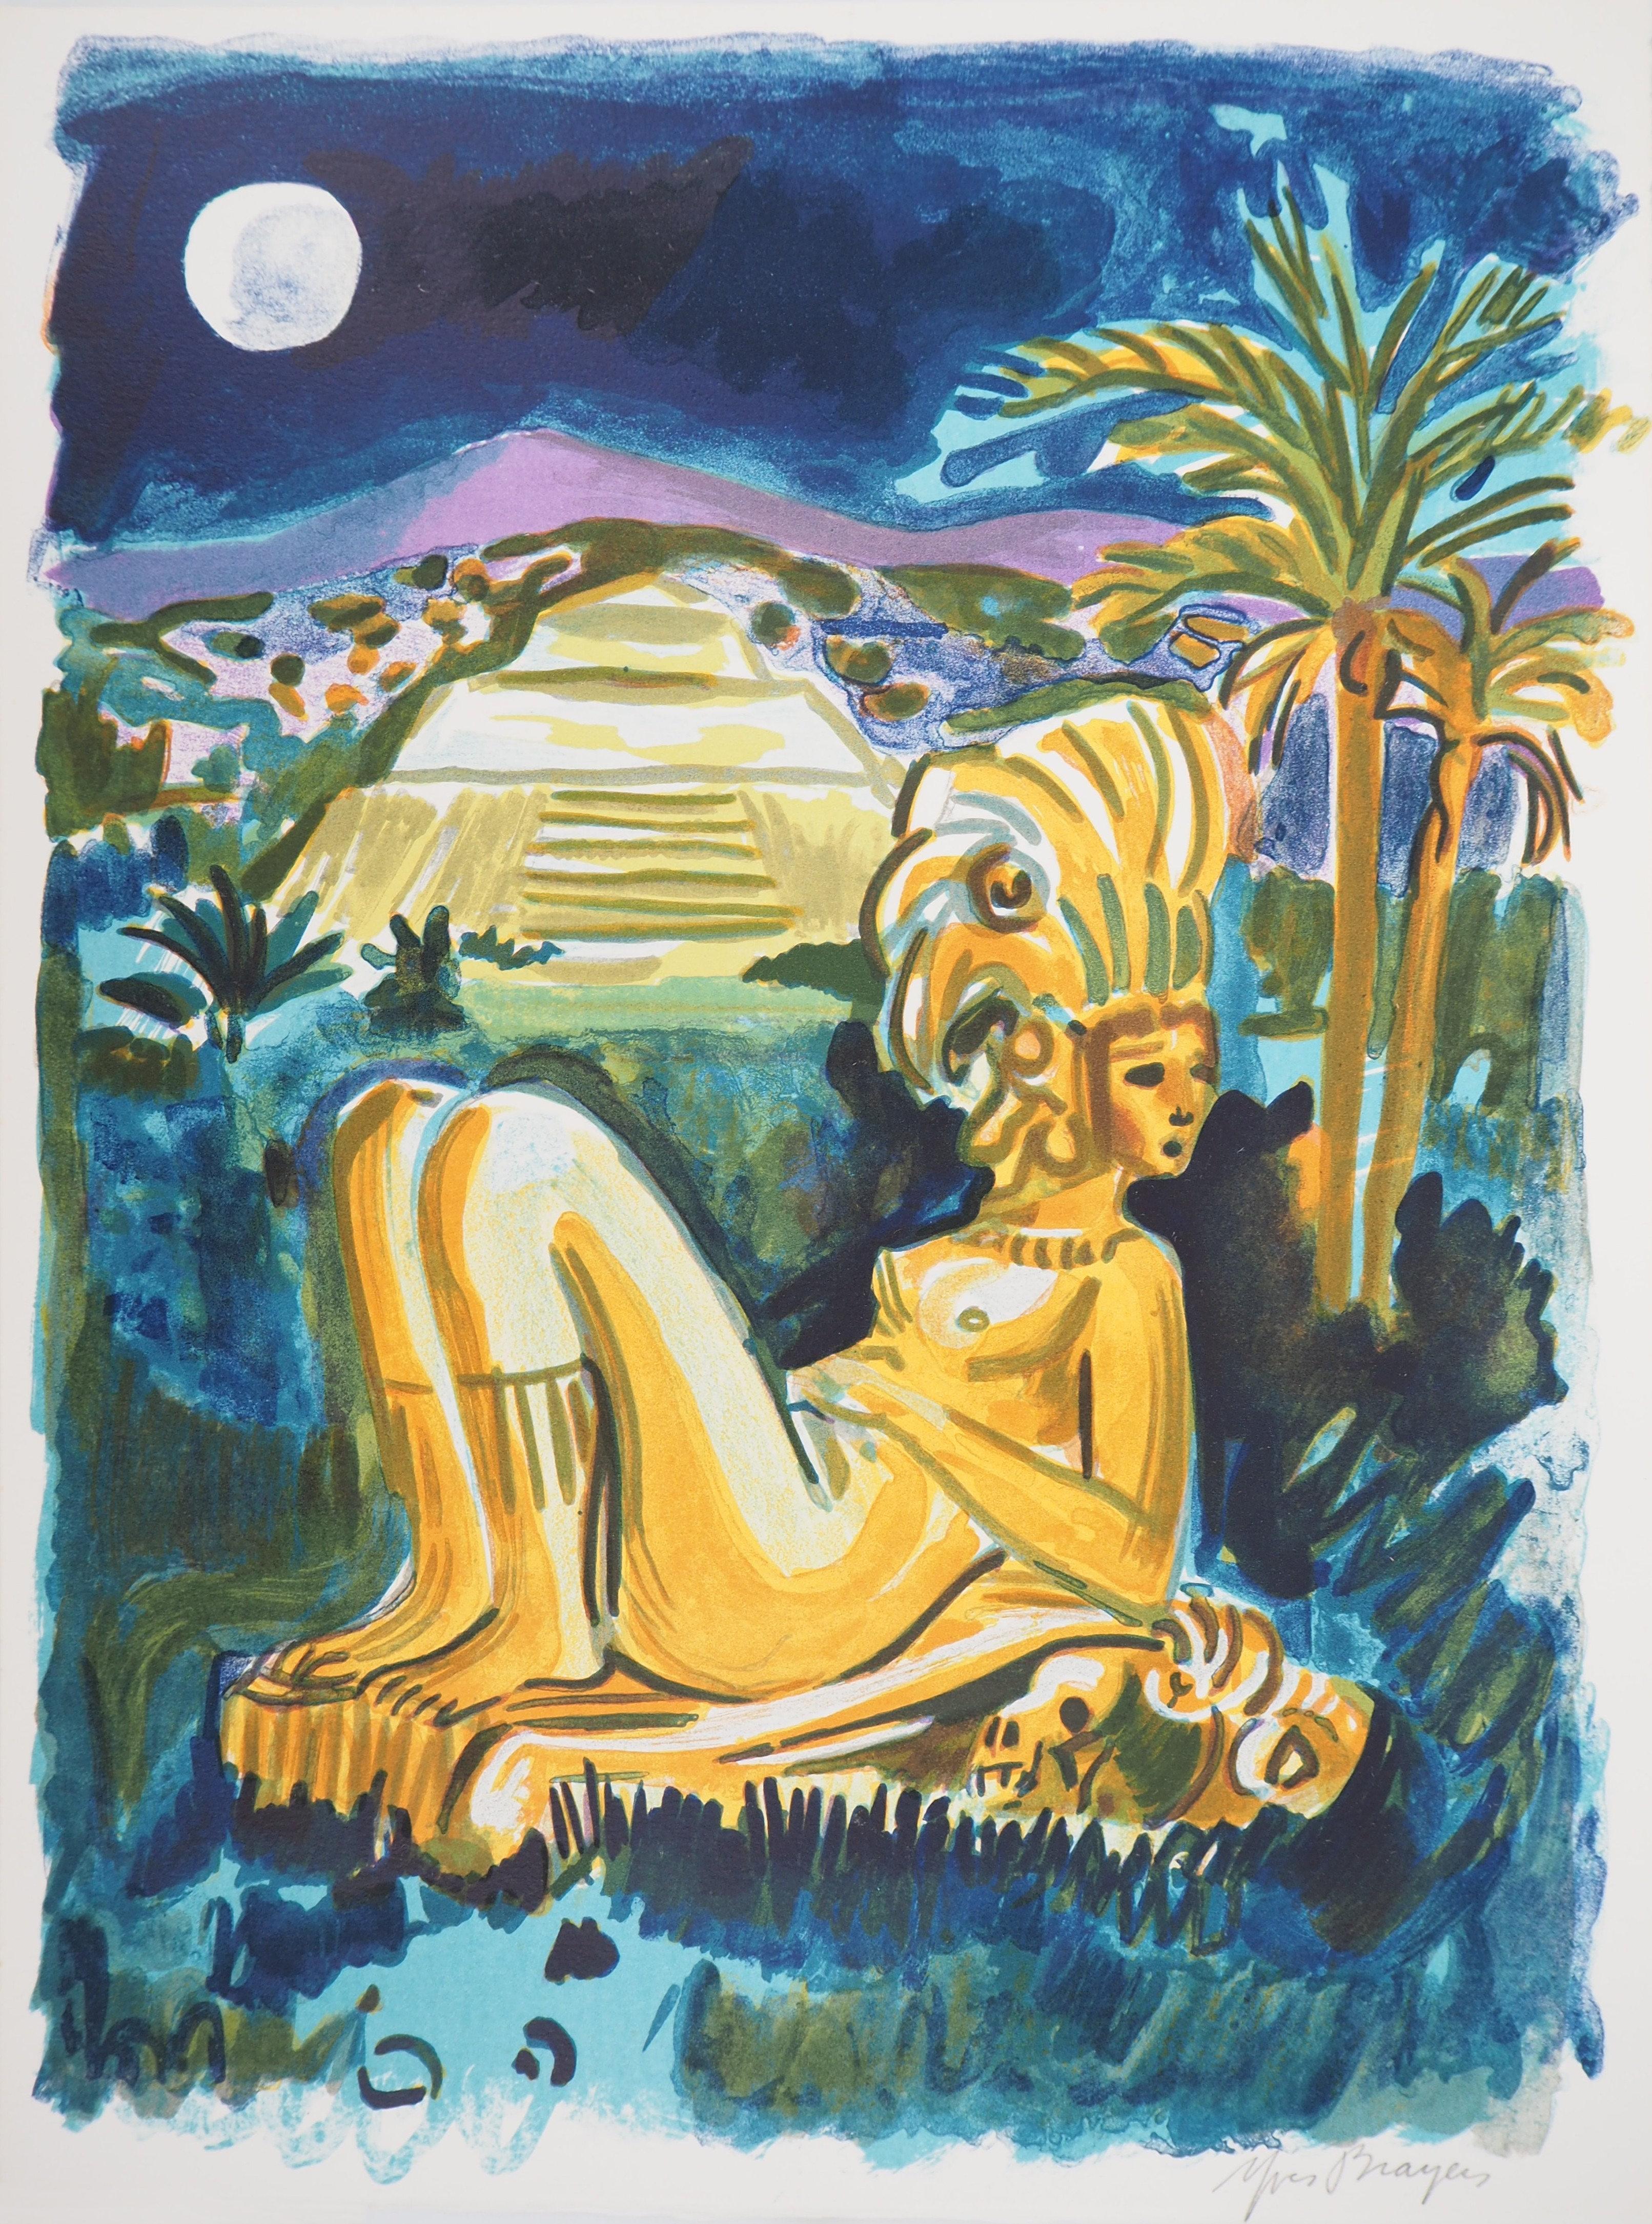 Mexico Mysteries (Pyramid) - Original handsigned lithograph